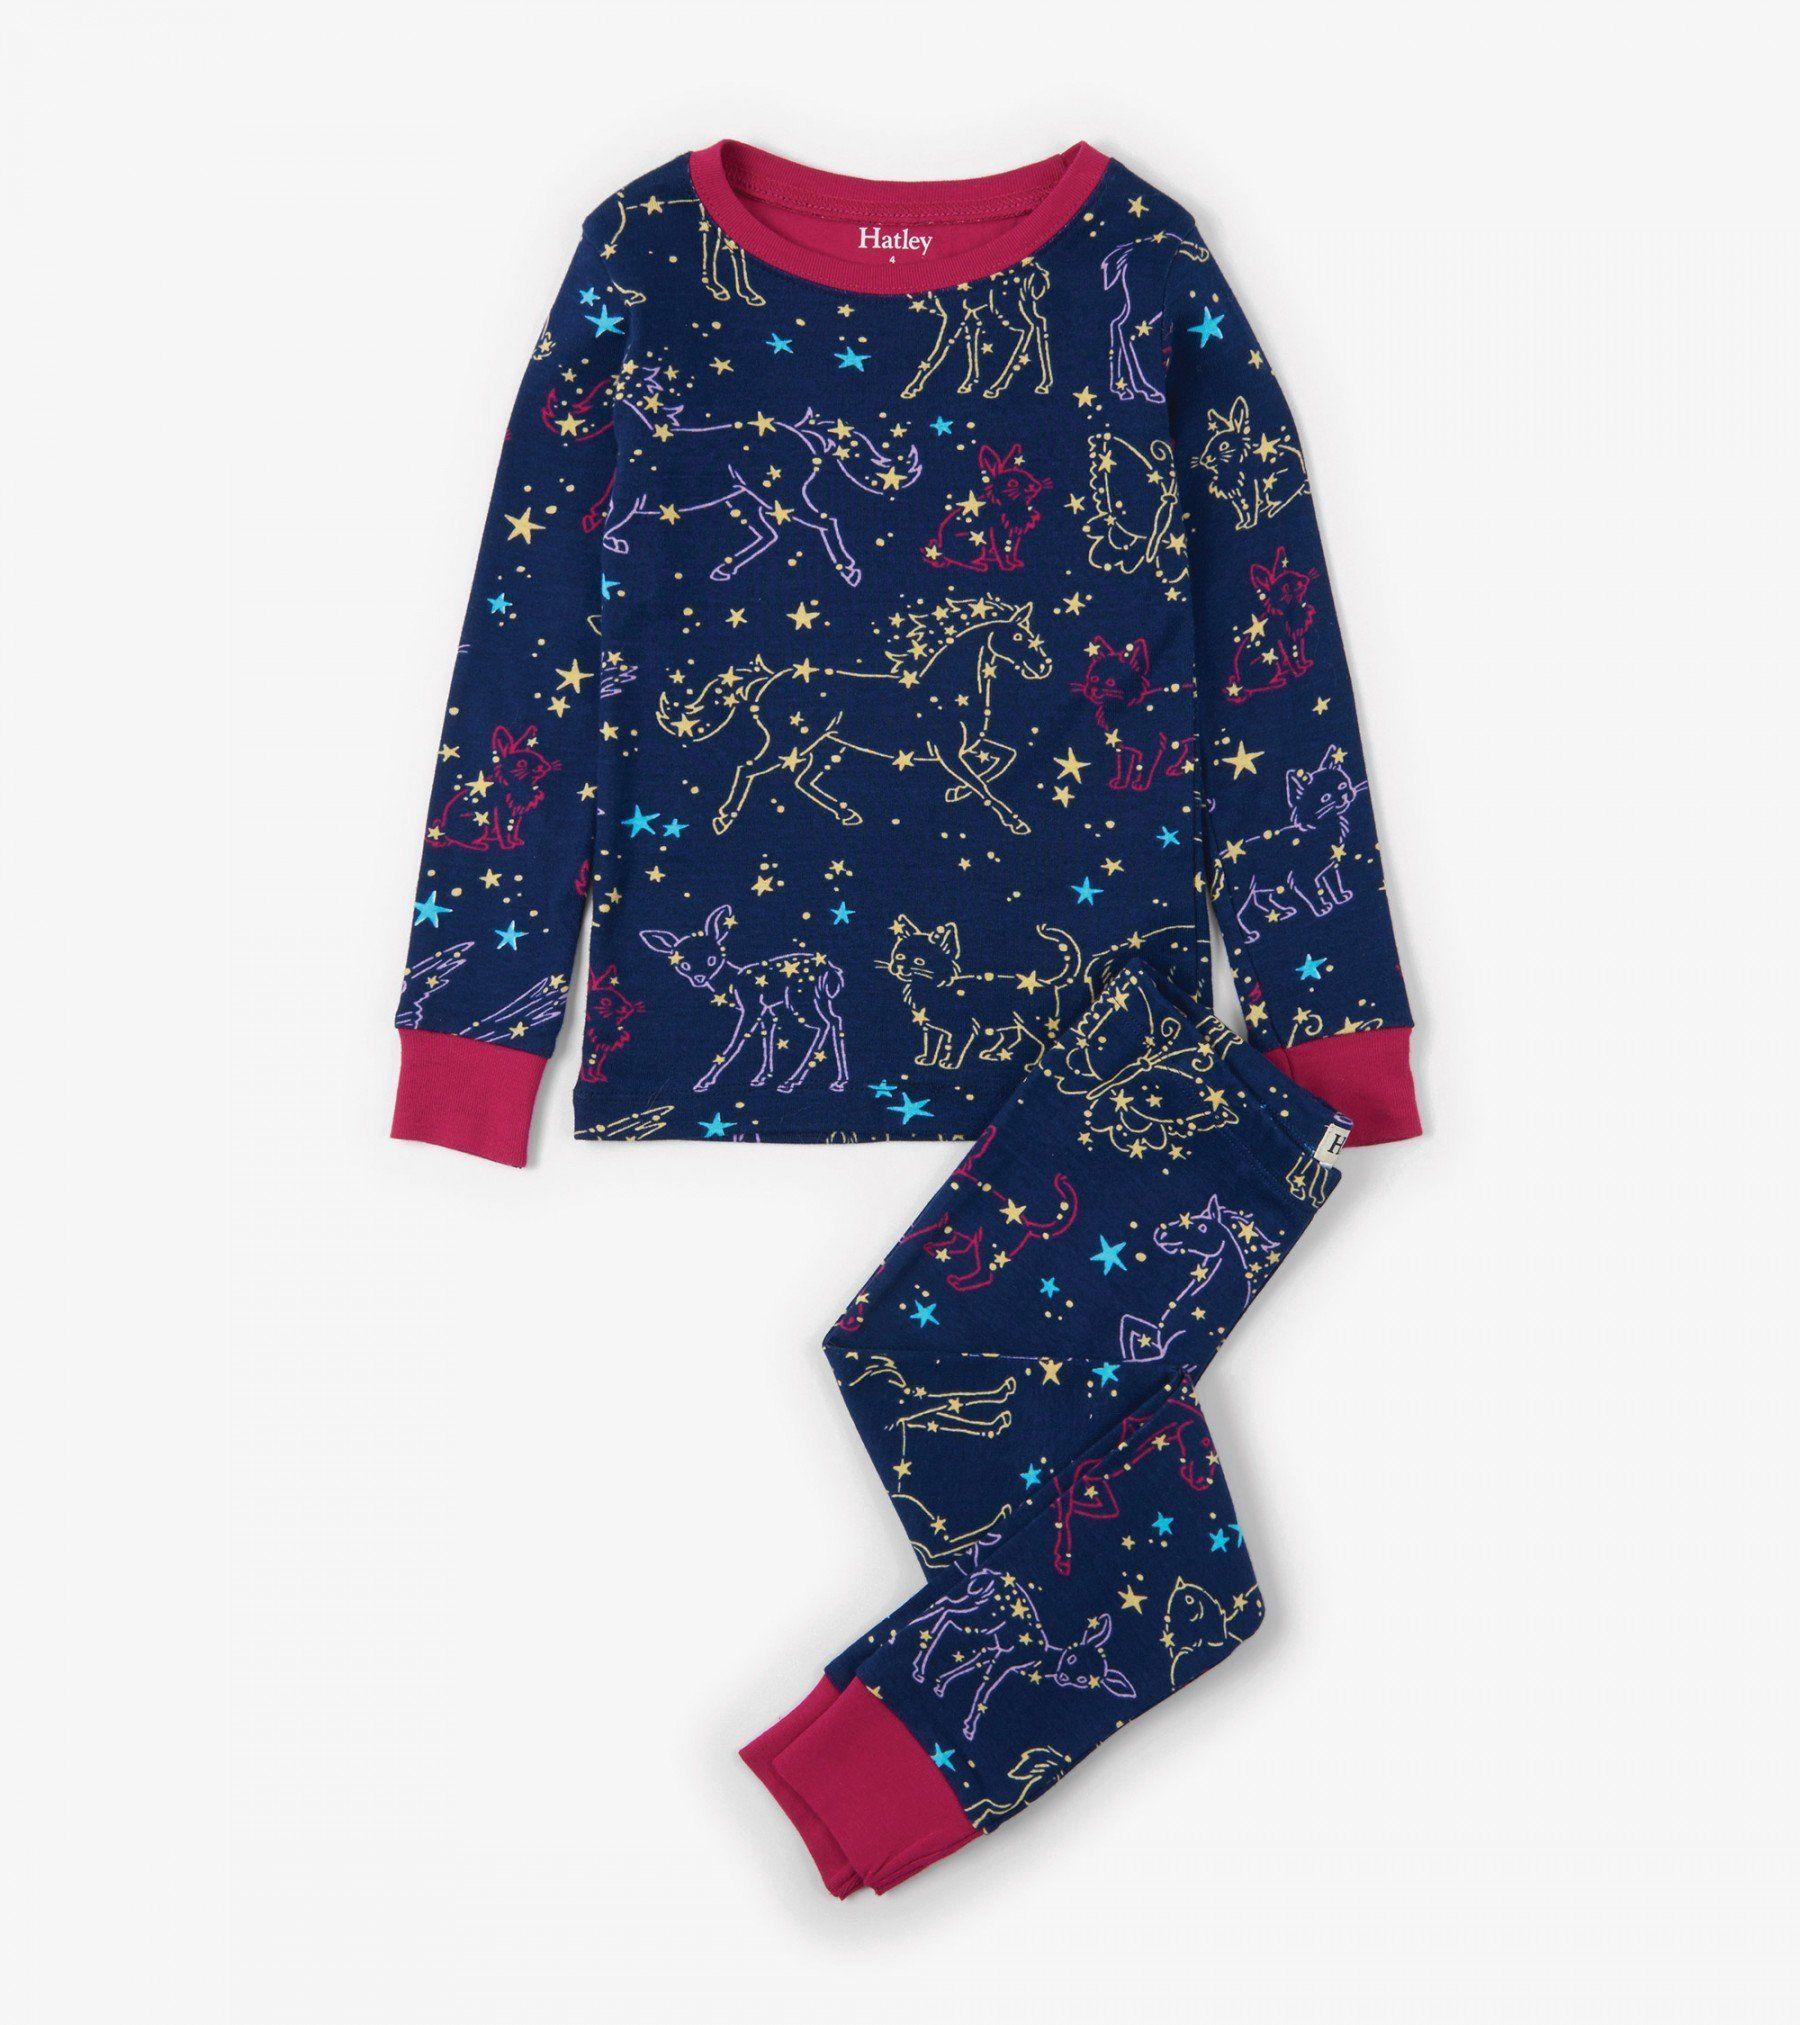 Celestial Night Organic Cotton Pajama Set Girls Shop